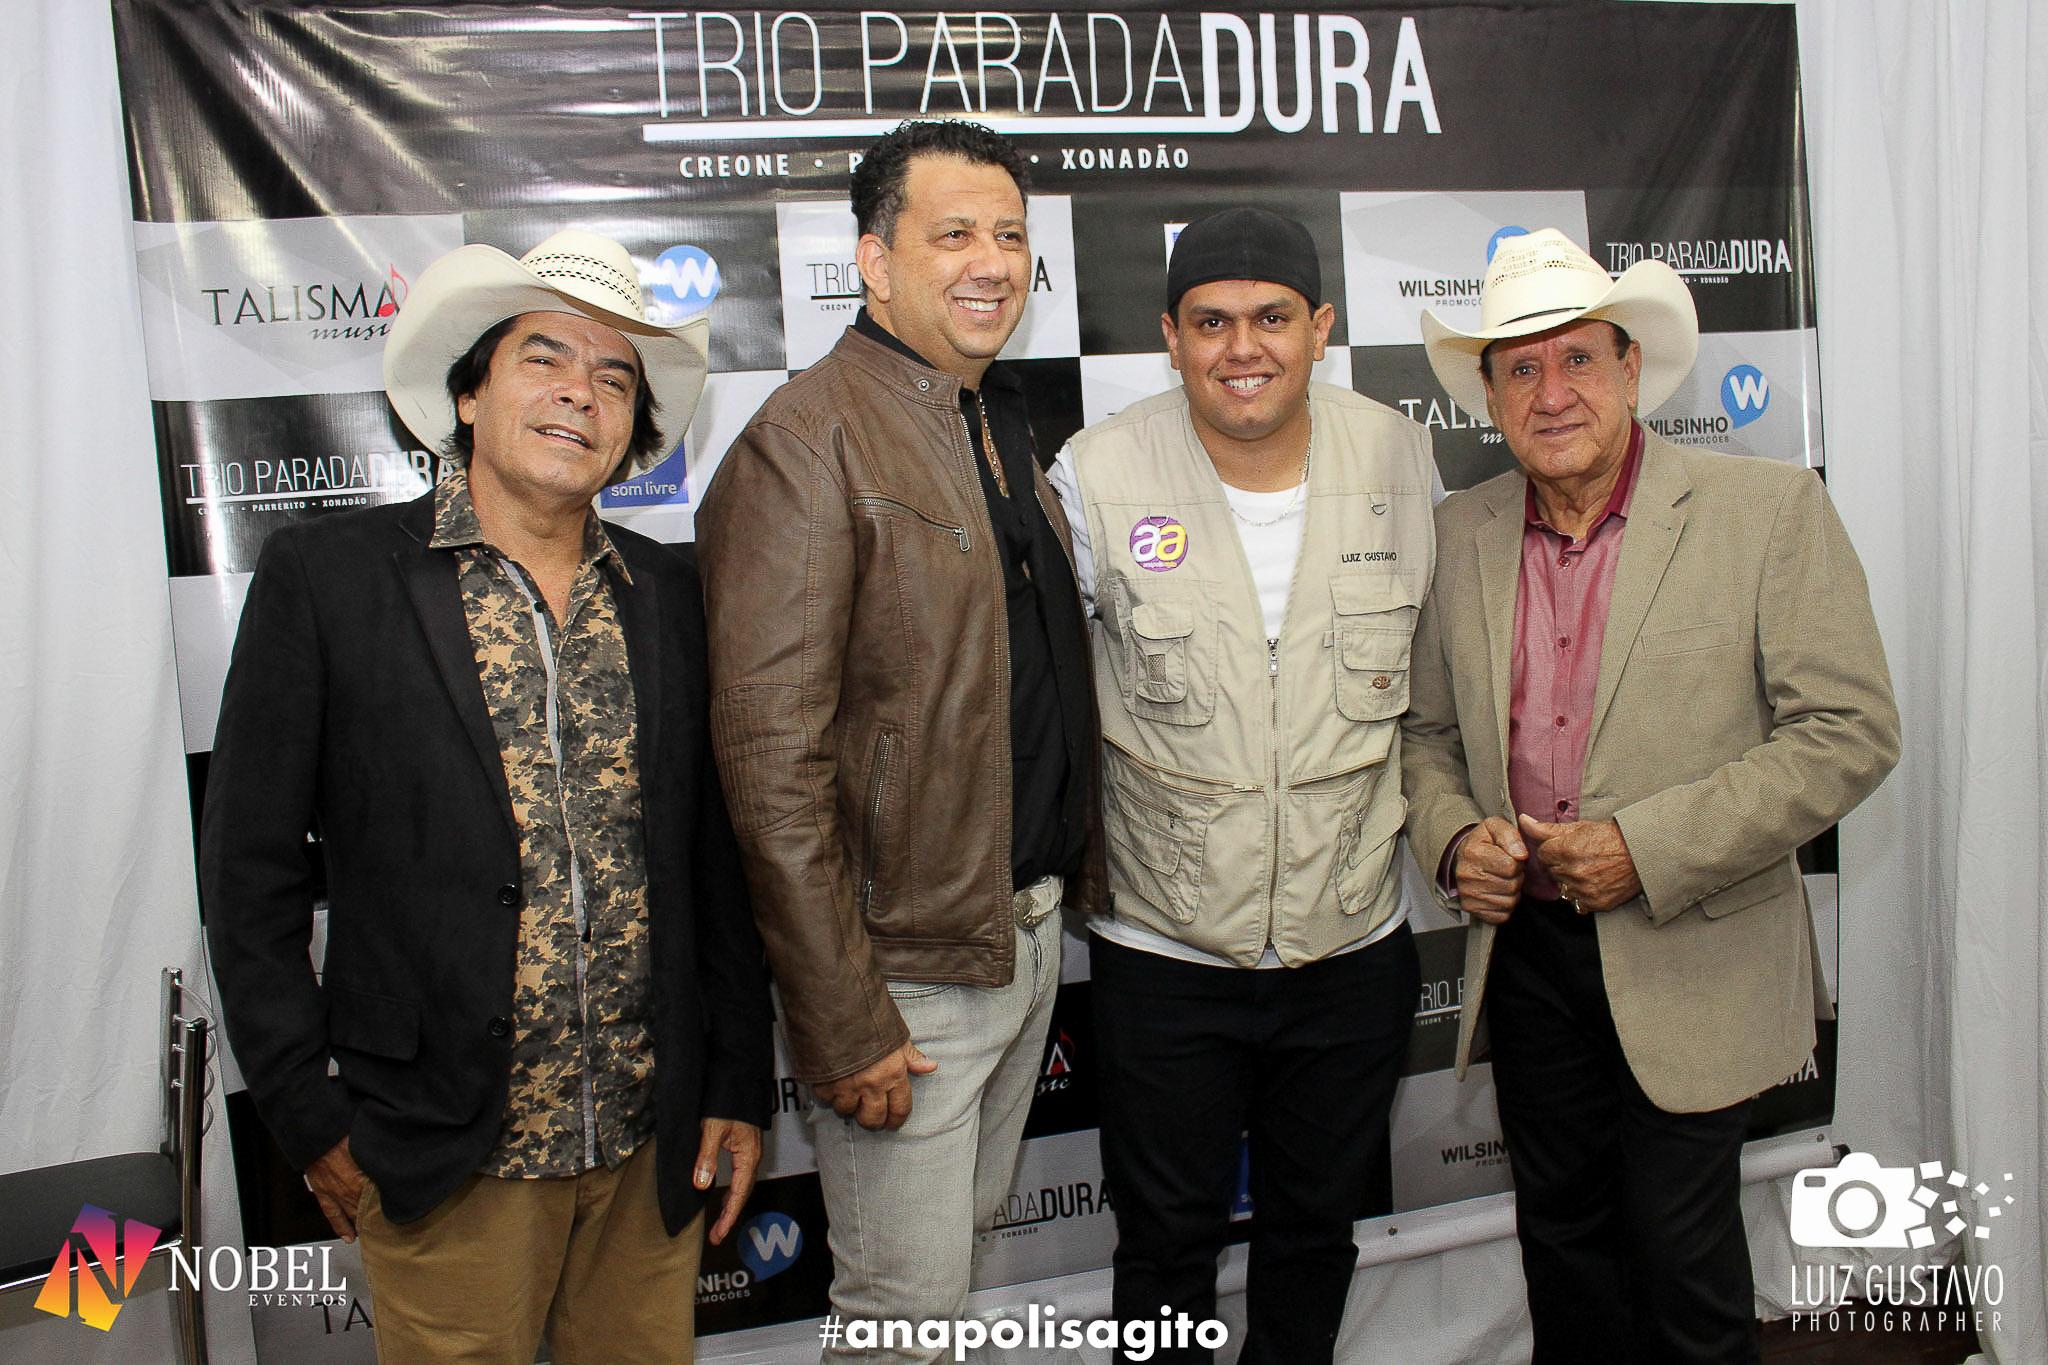 Luiz Gustavo Photographer-175